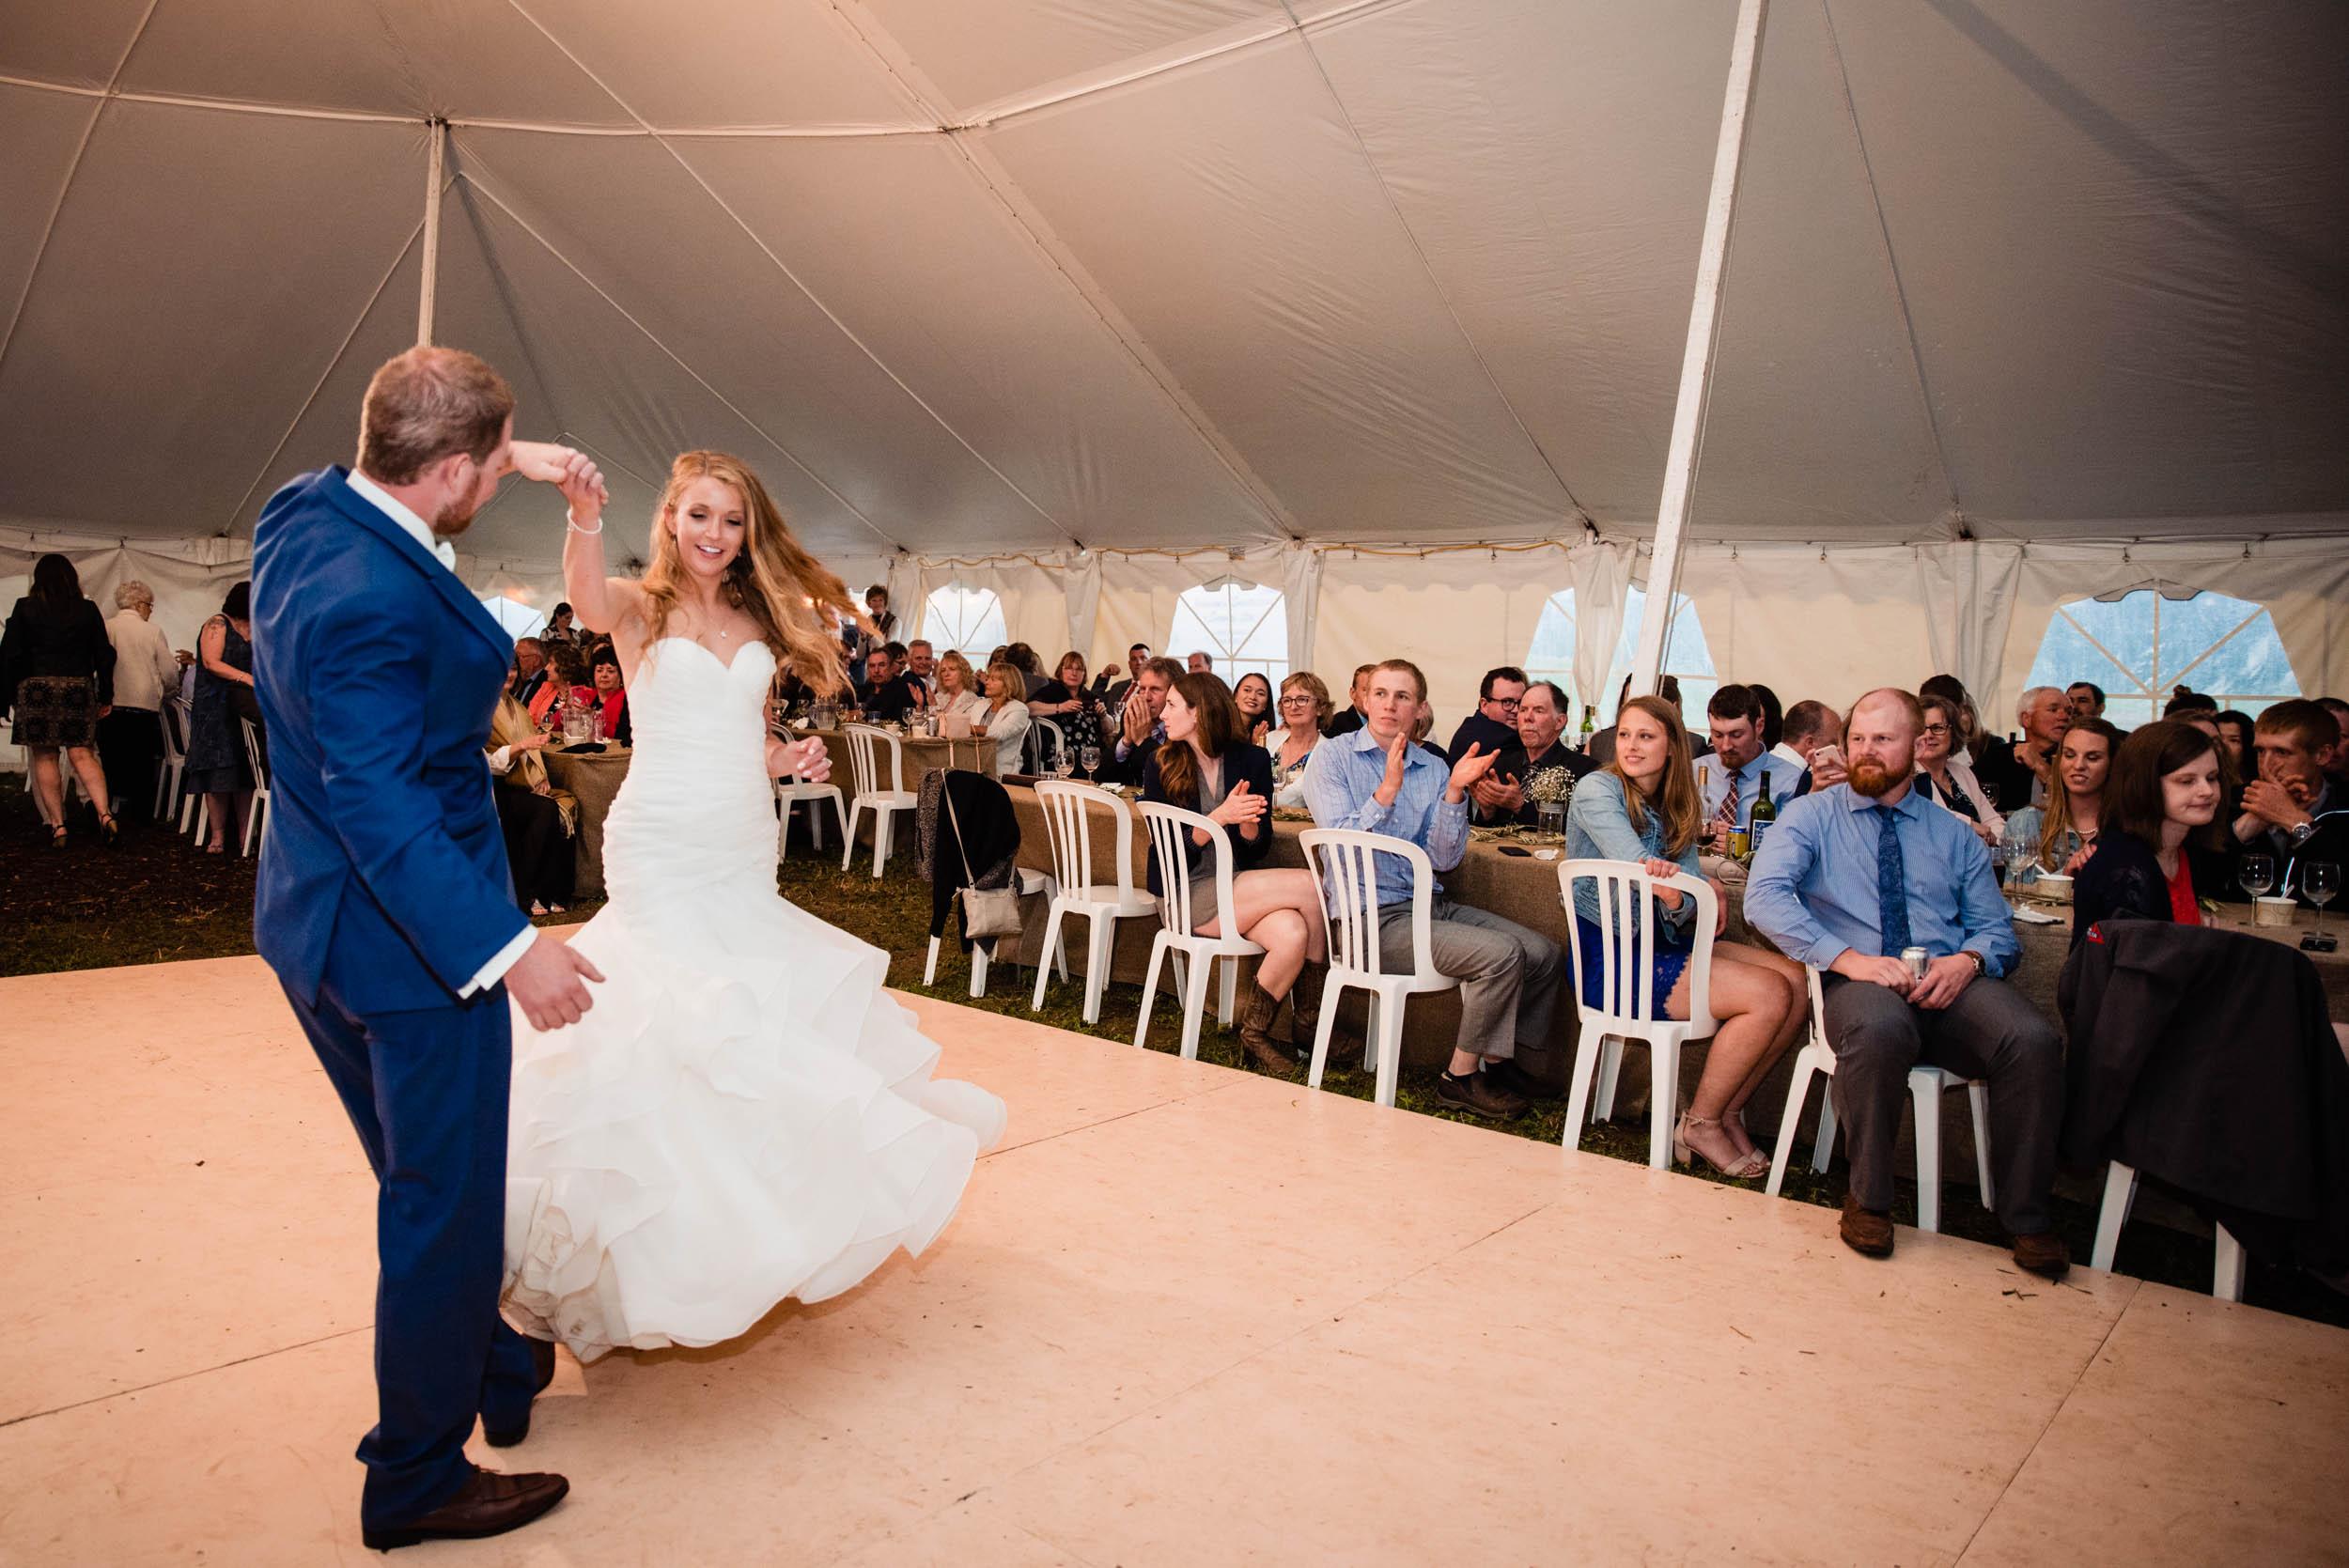 london-ontario-wedding-photography-farm-tent (114).jpg